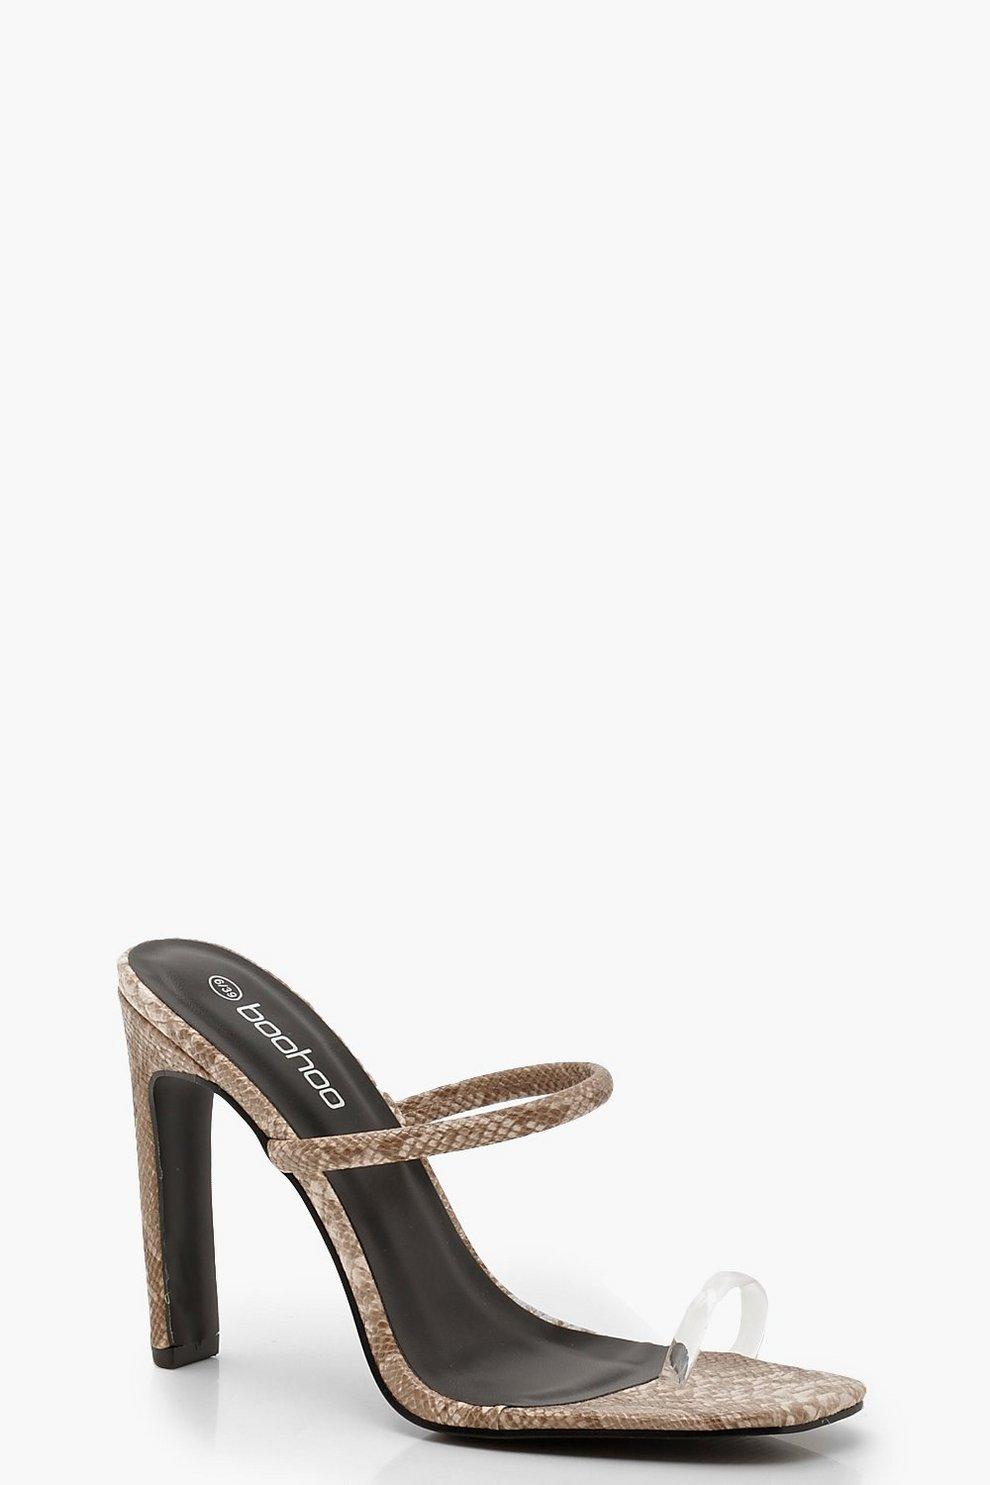 9e4ee22e1 Womens Beige Snake Toe Post Flat Heel Mules